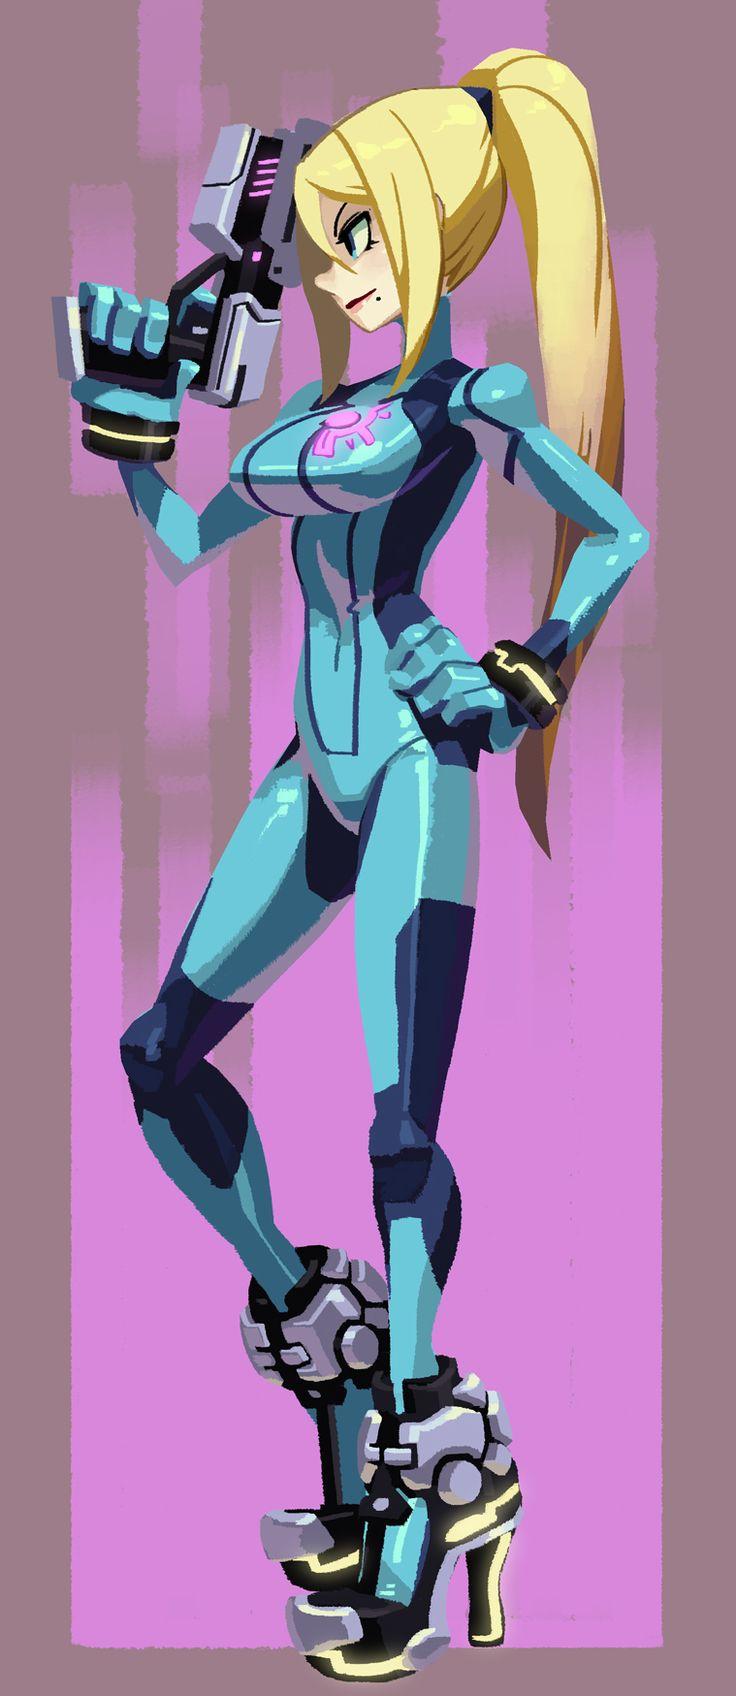 Skullgirls artist takes on his own Zero Suit Samus Aran design | #Skullgirls #Metroid